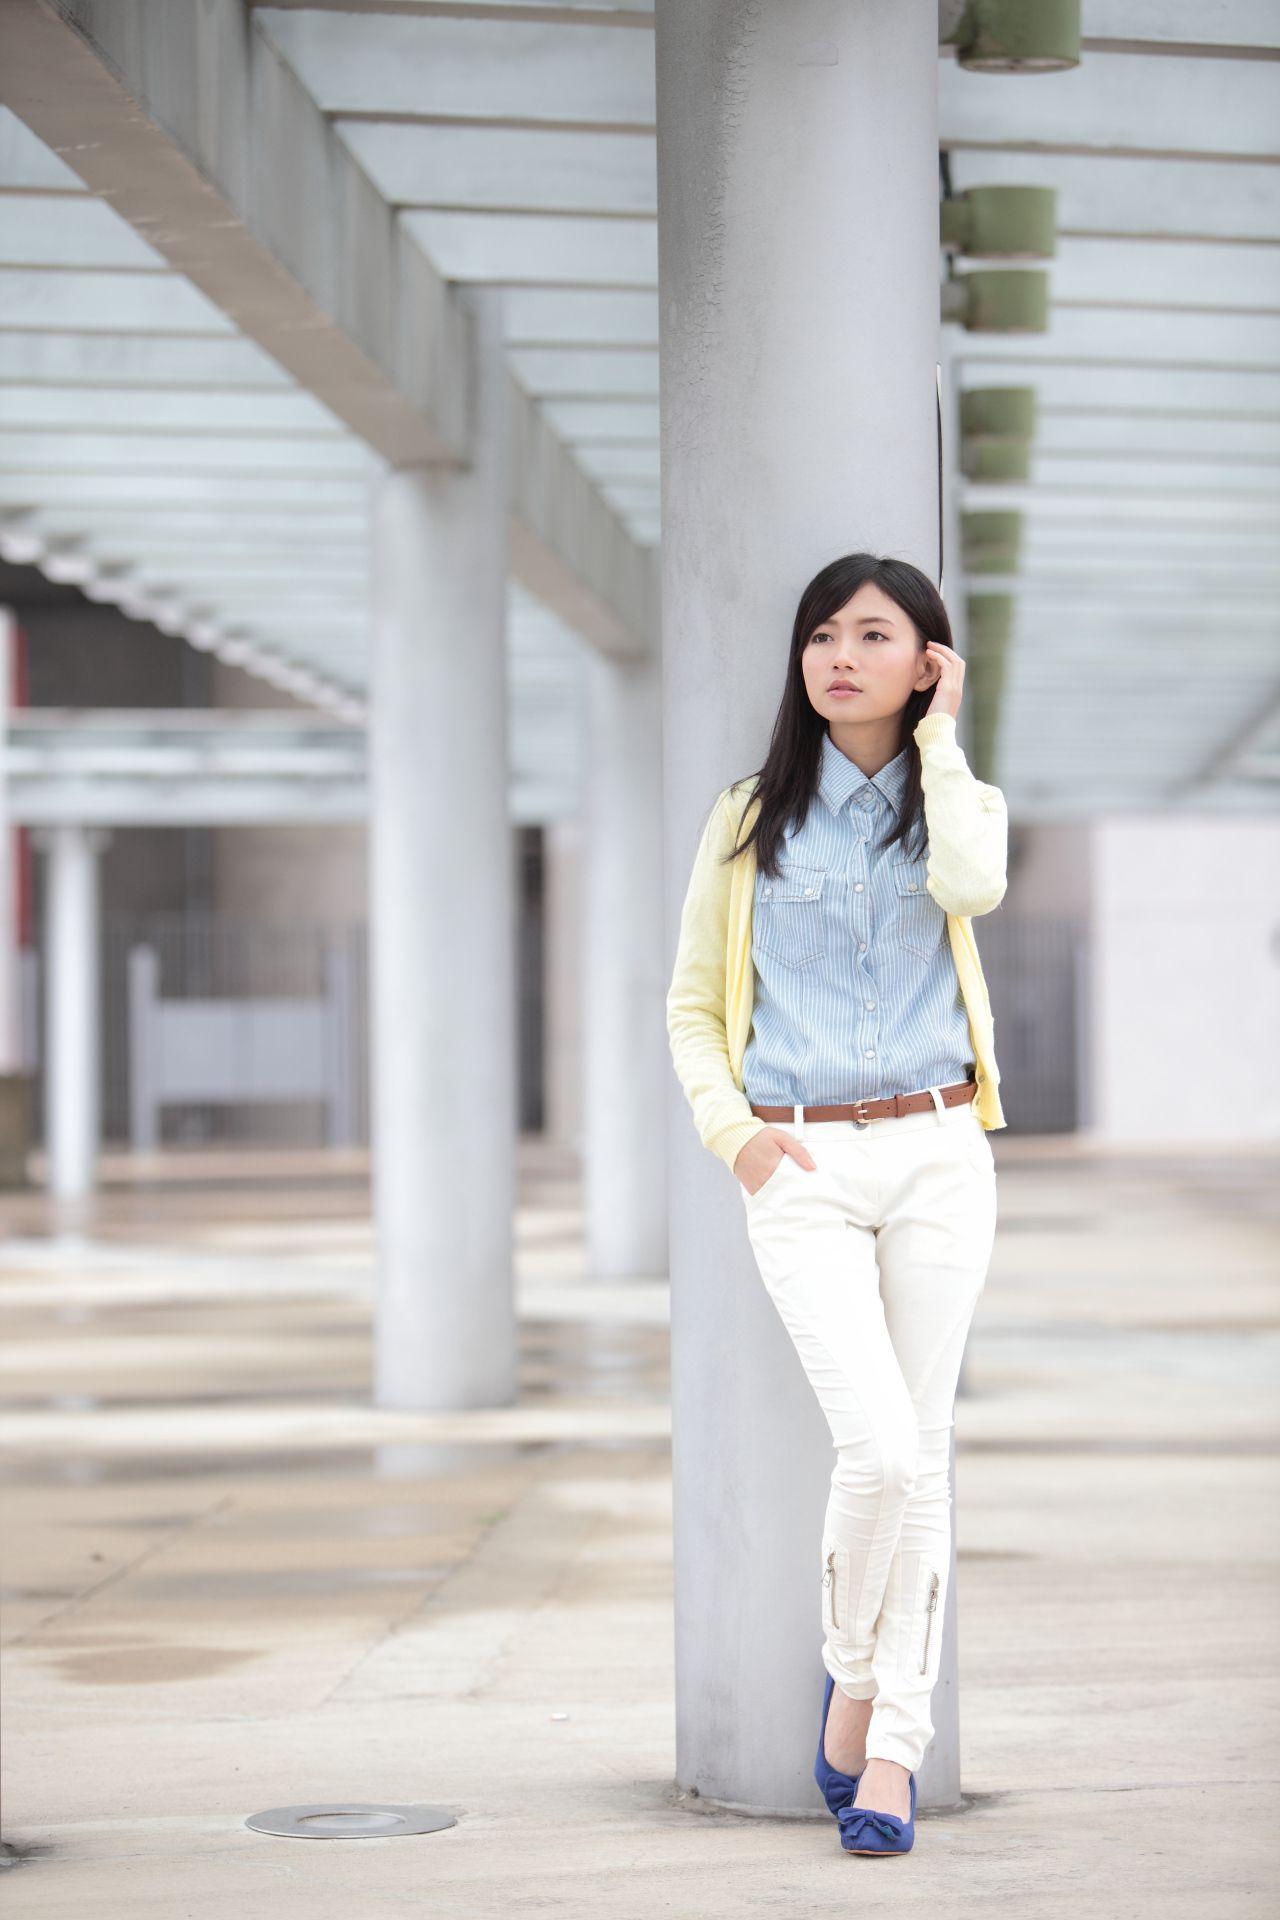 VOL.80 [台湾正妹]清纯甜美街拍正妹紧身裤平胸:可艾高品质写真套图(74P)